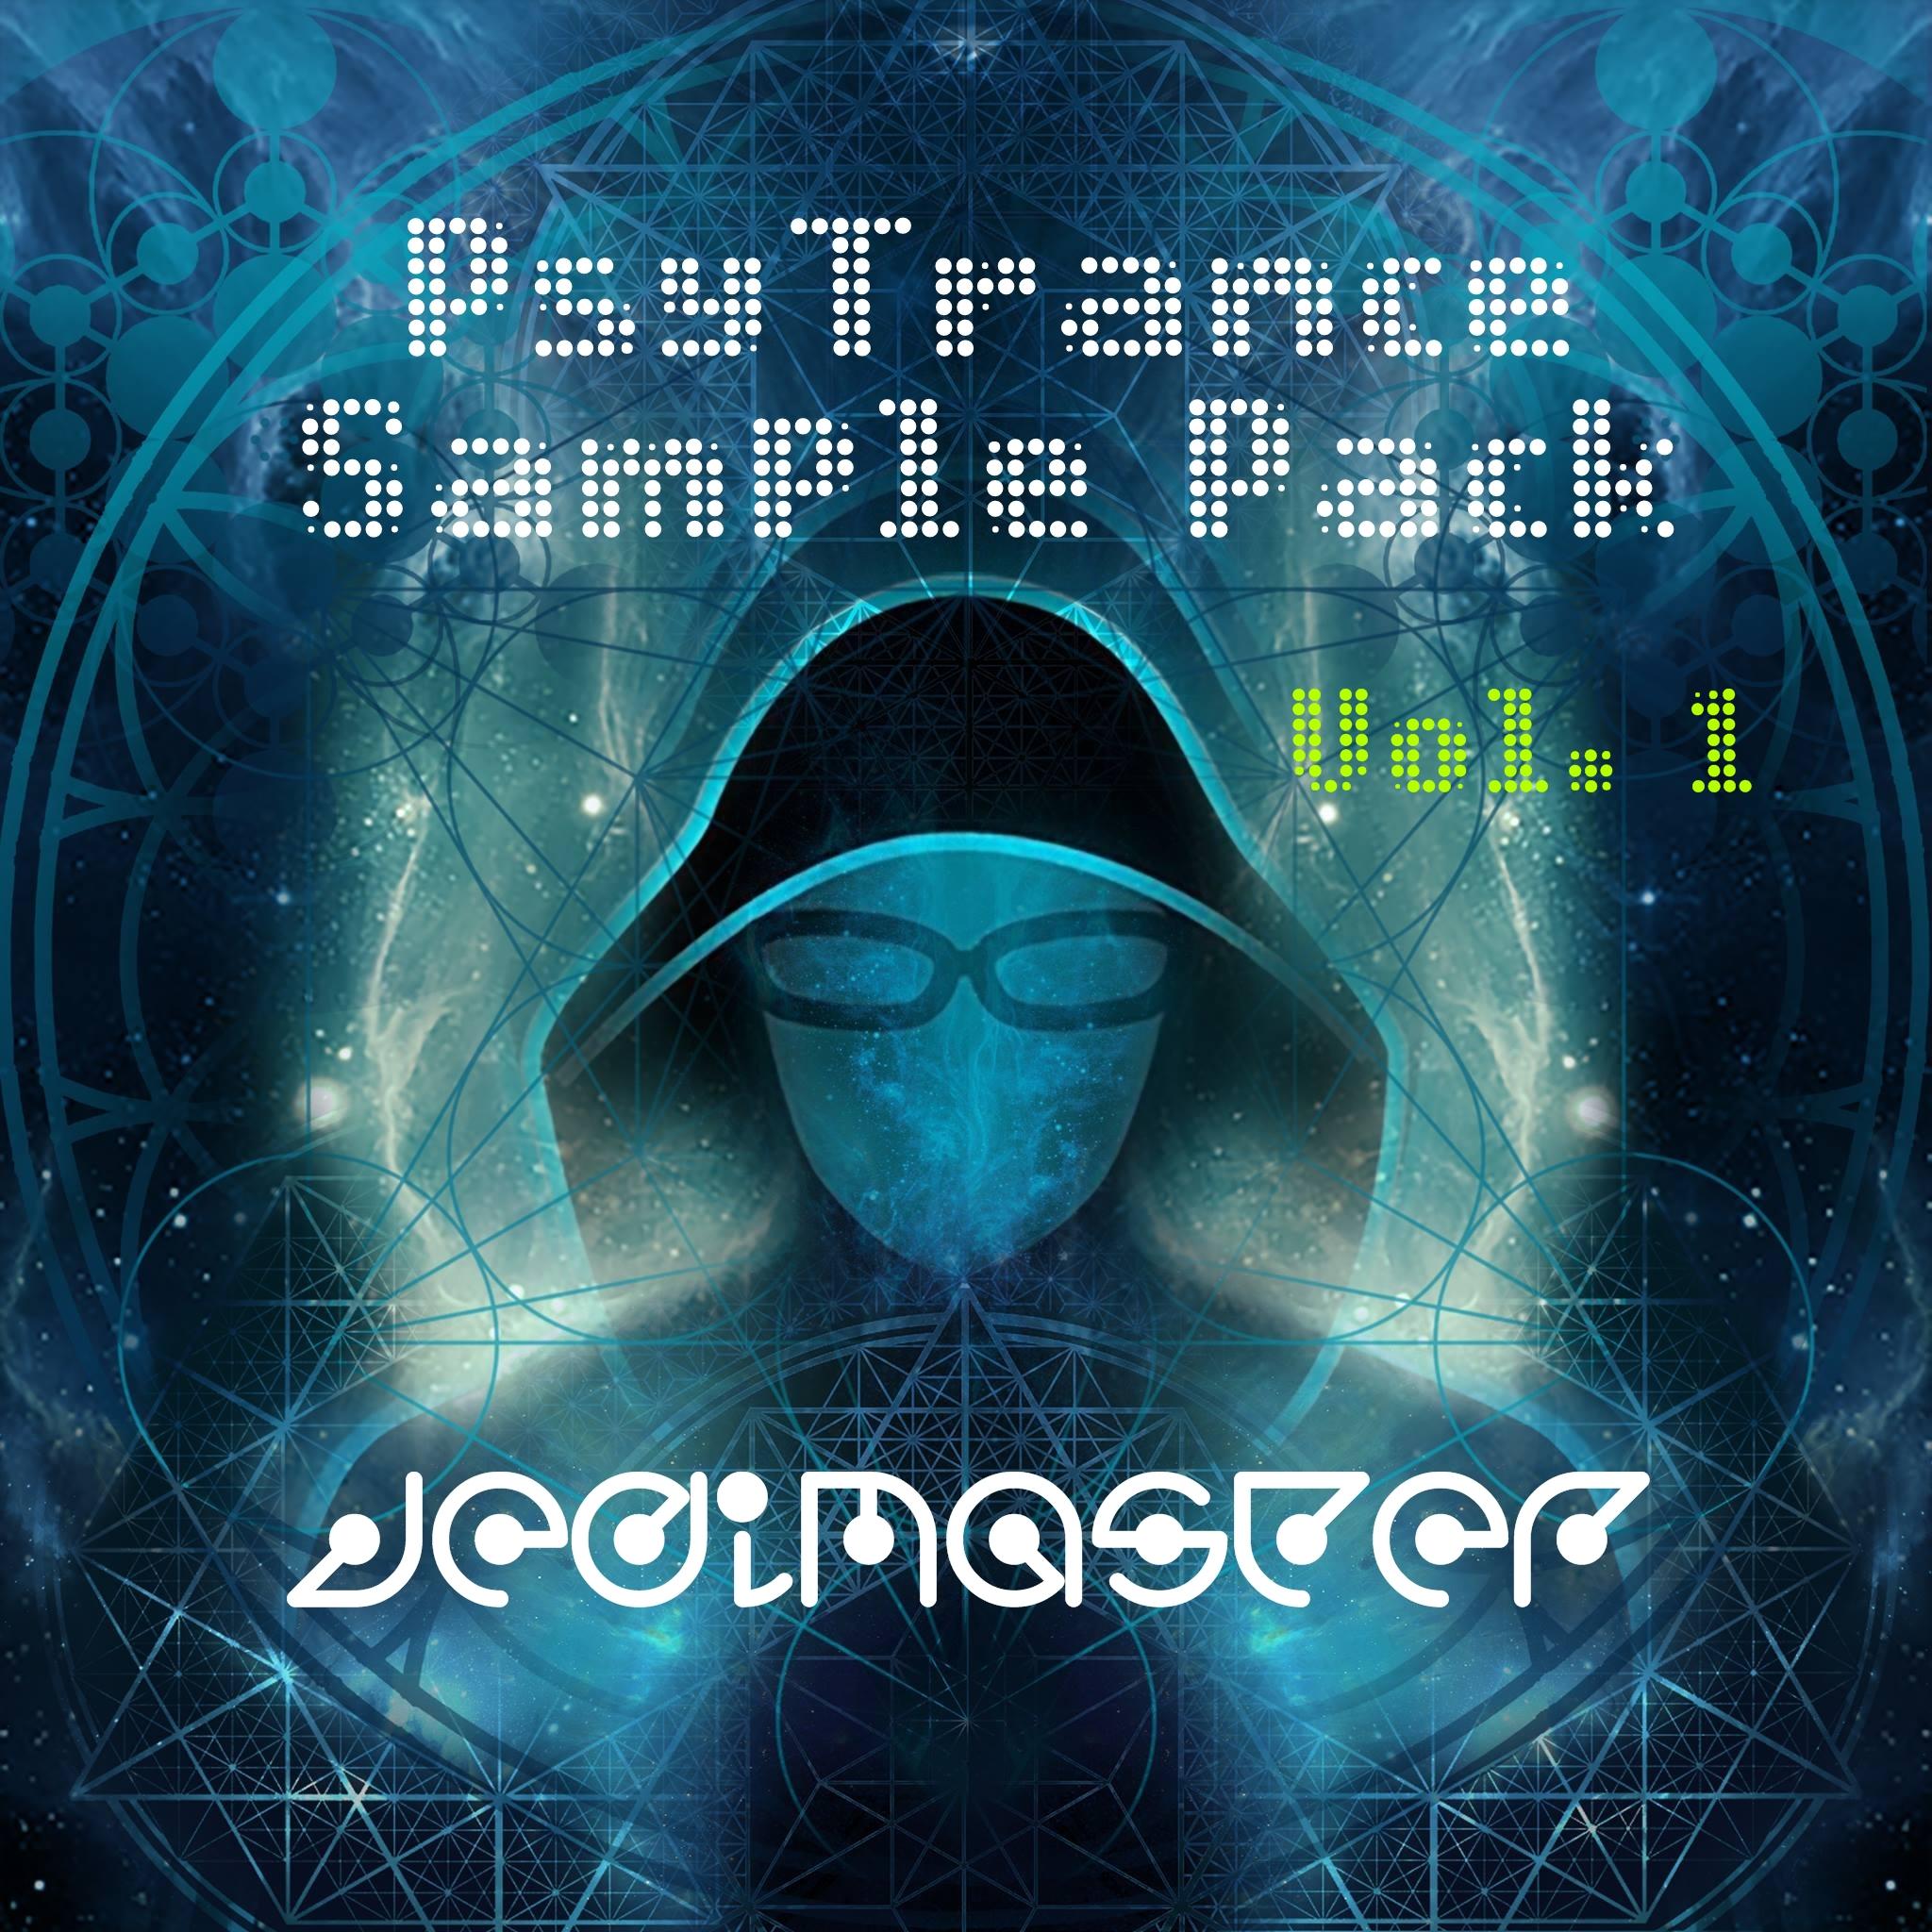 Free Psy Trance Sample Pack PsyTrance-Sample-Pack-1